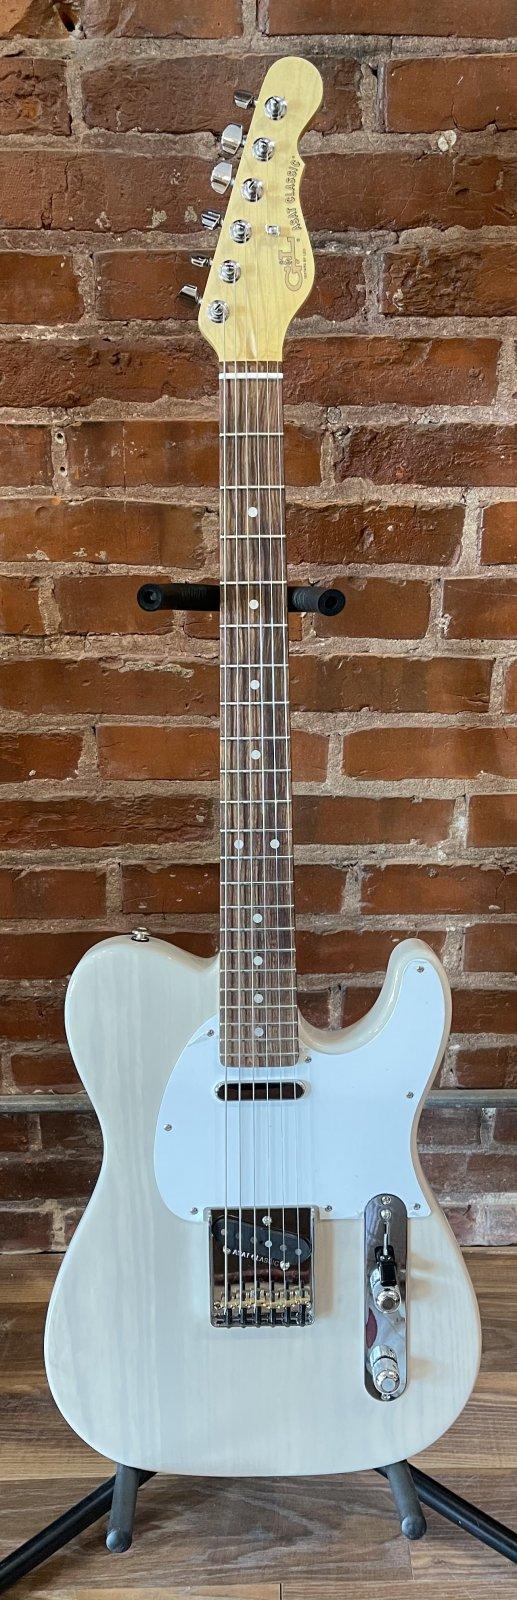 G&L USA Fullerton Deluxe ASAT Classic Alnico Electric Guitar